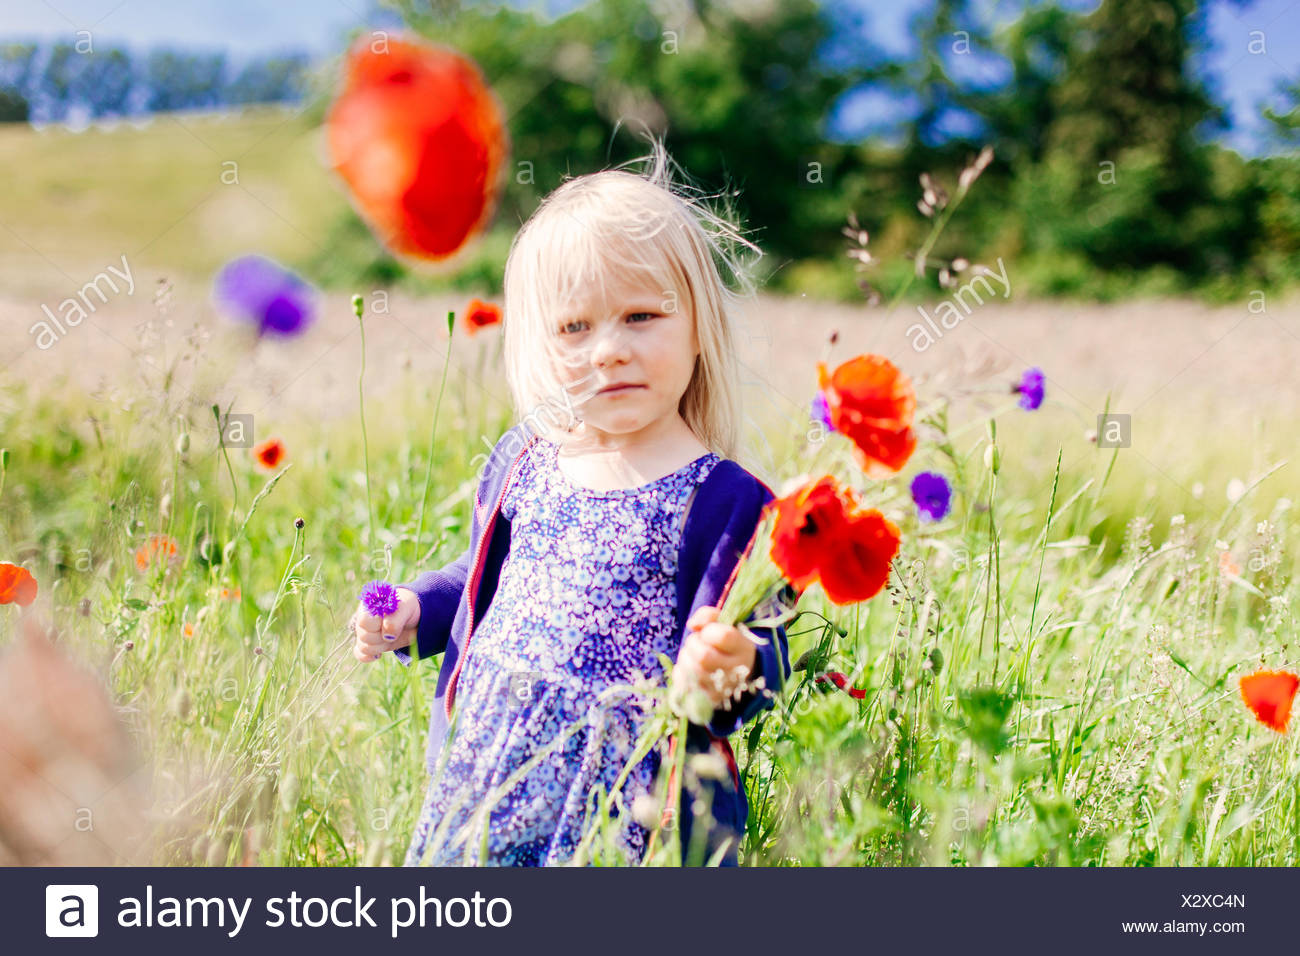 Girl holding poppy flowers at grassy field - Stock Image